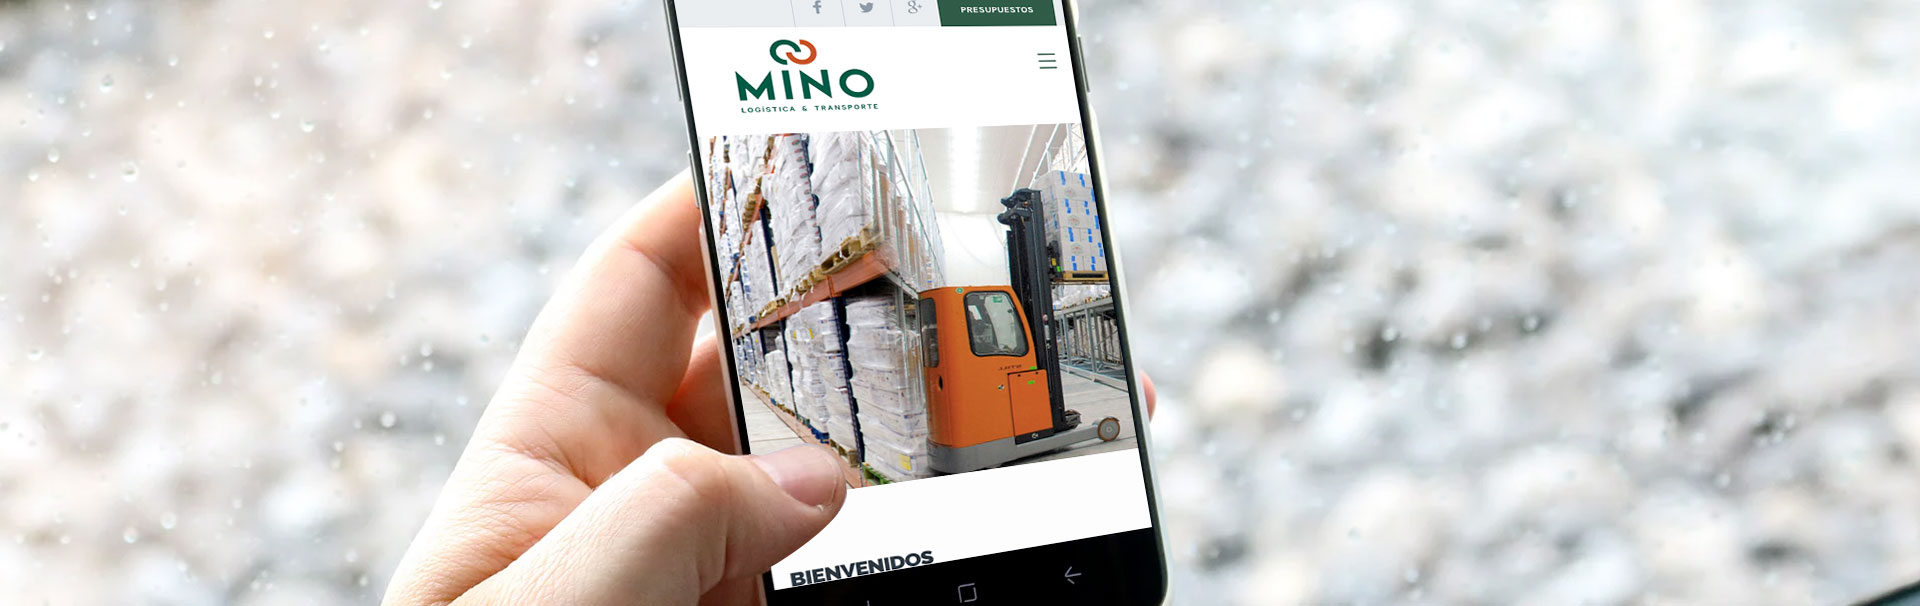 Mino Transporte